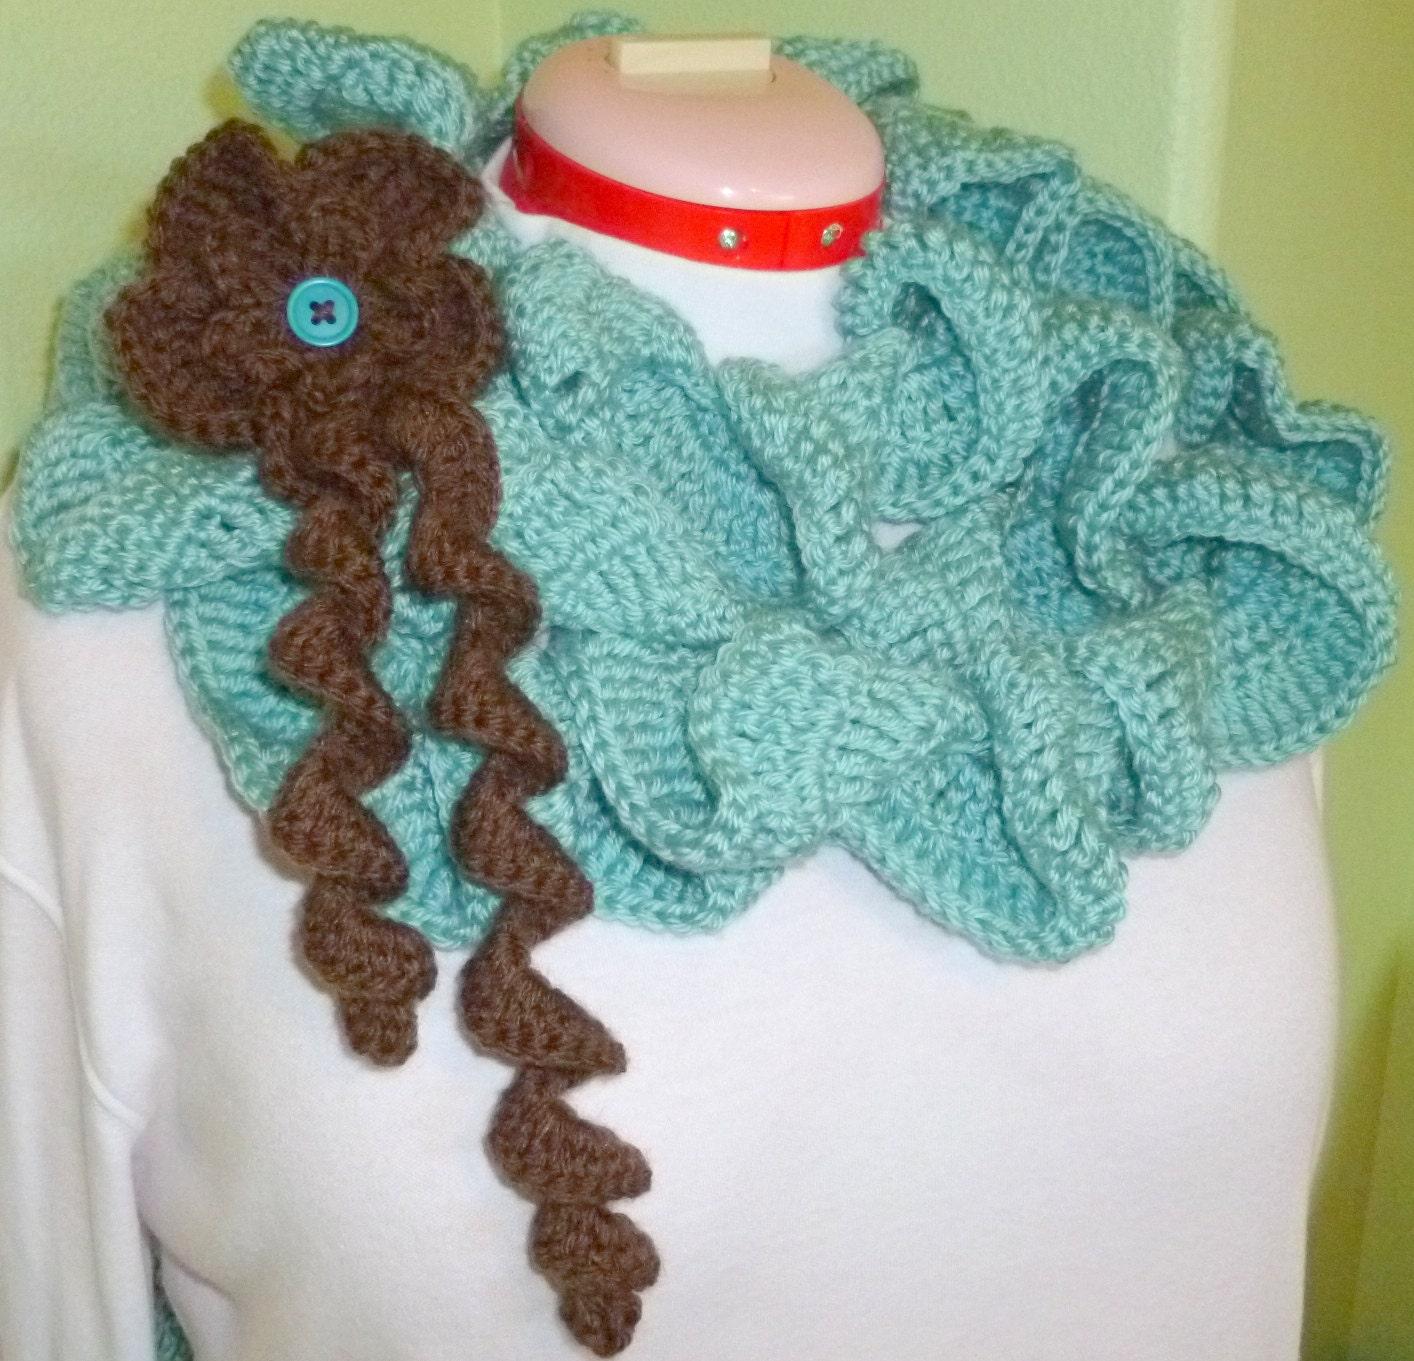 Crochet Ruffled Scarf Scarflette Fashion by berly731 on Etsy